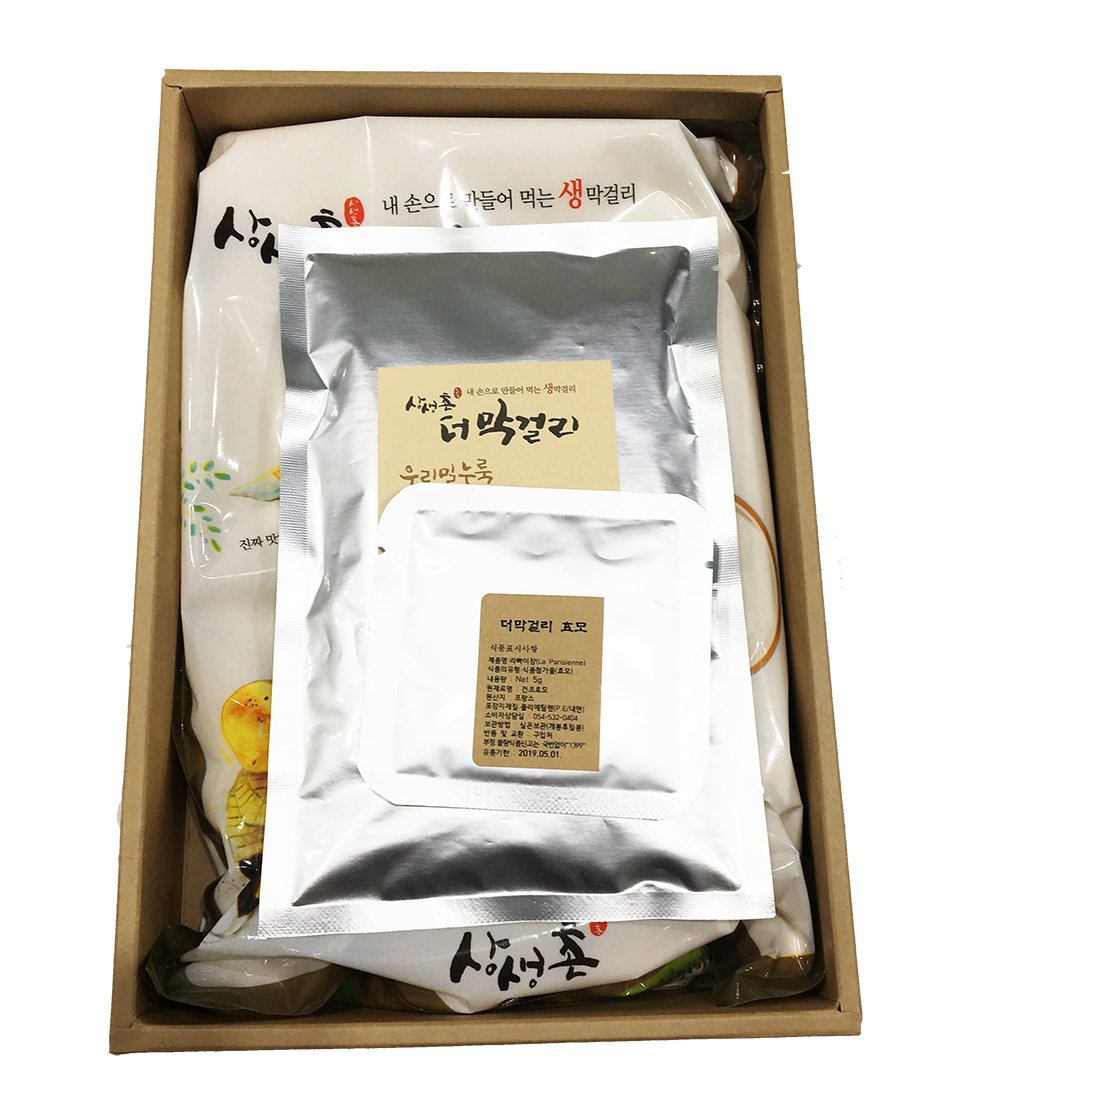 The Makgeolli Korean Traditional Organic Rice Wine Home Brewing DIY Kit 2.2lb by SangSaengChon (Image #3)